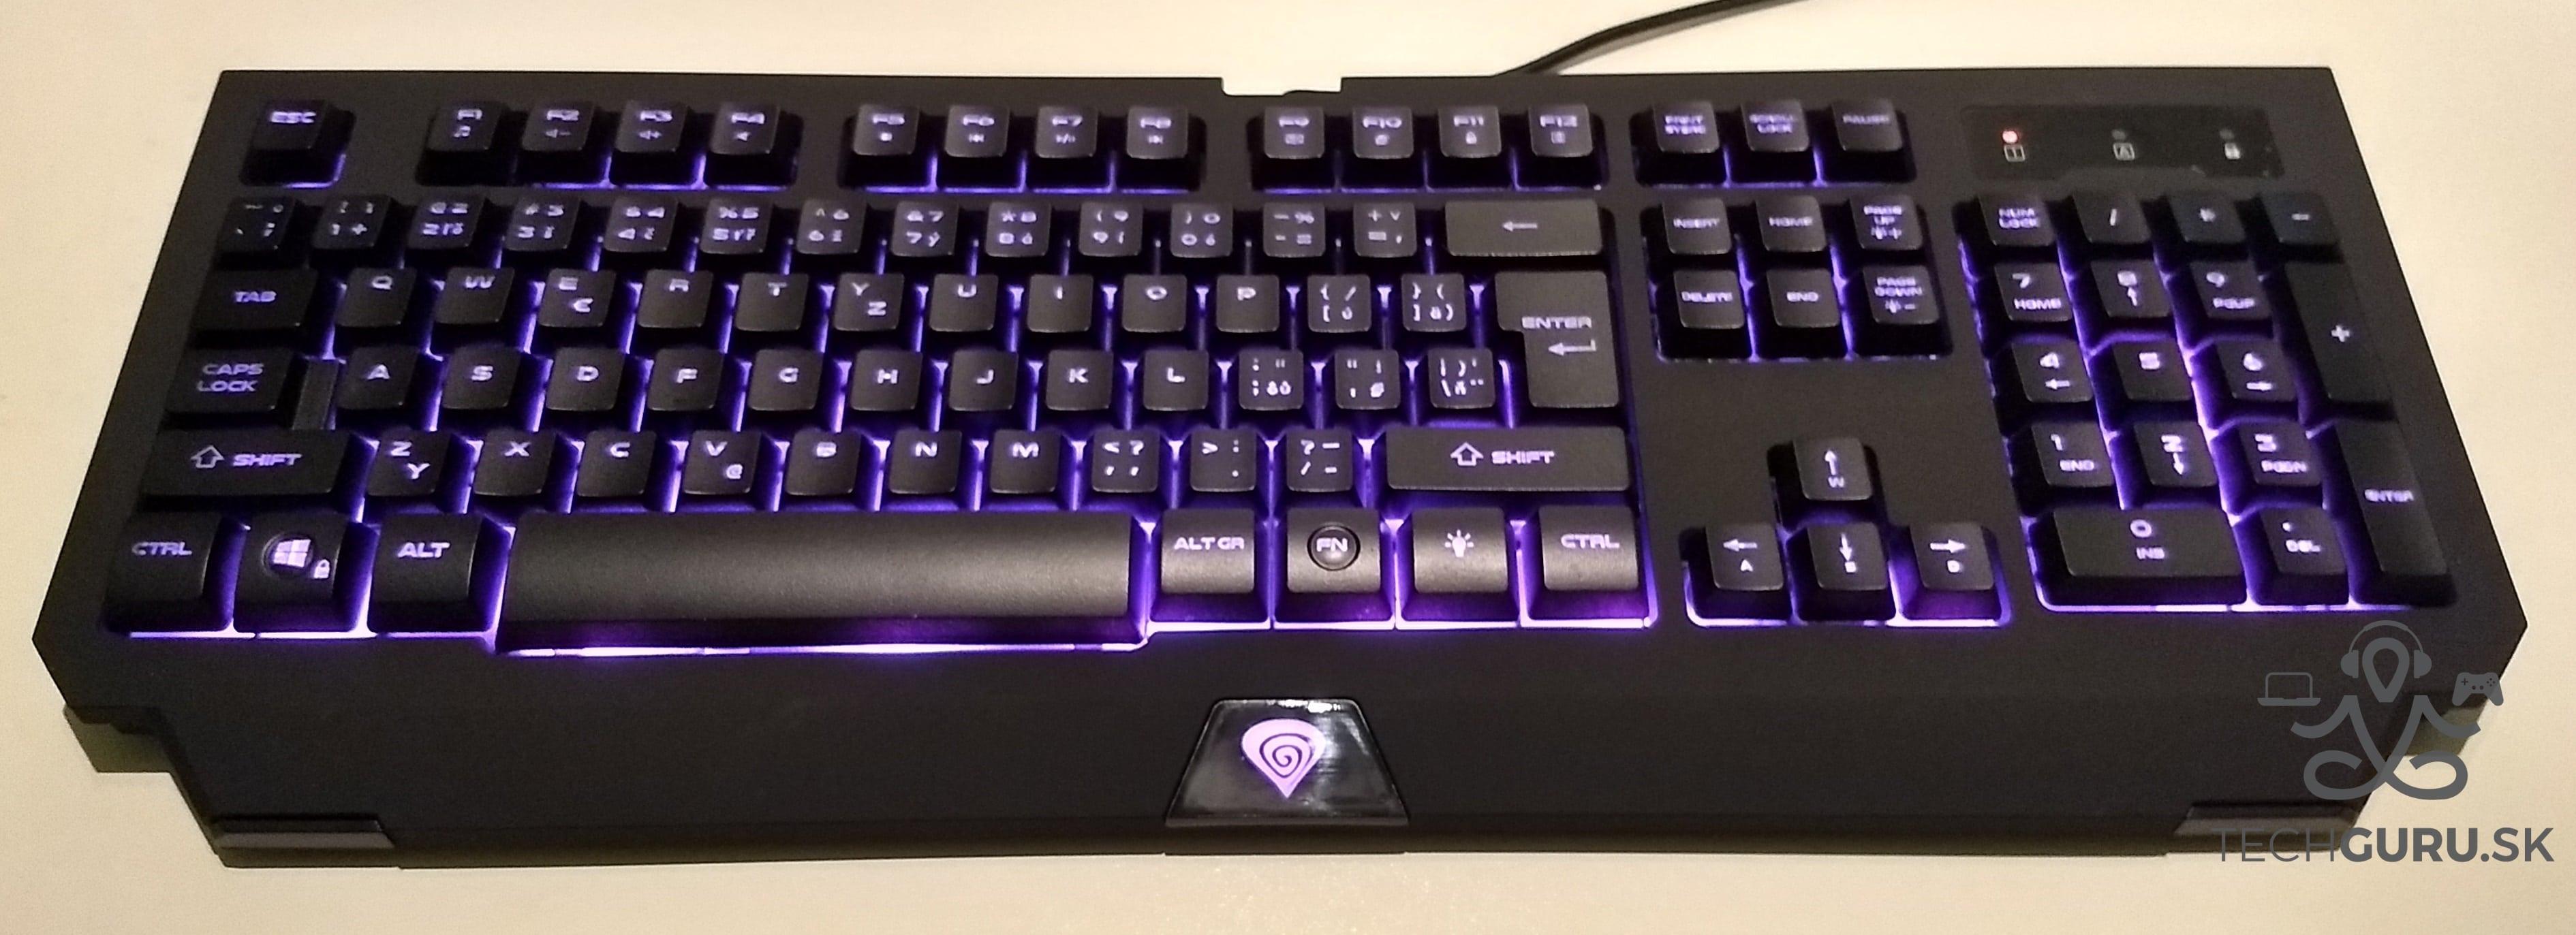 Genesis Cobalt 300 klávesnica podsvietenie 01